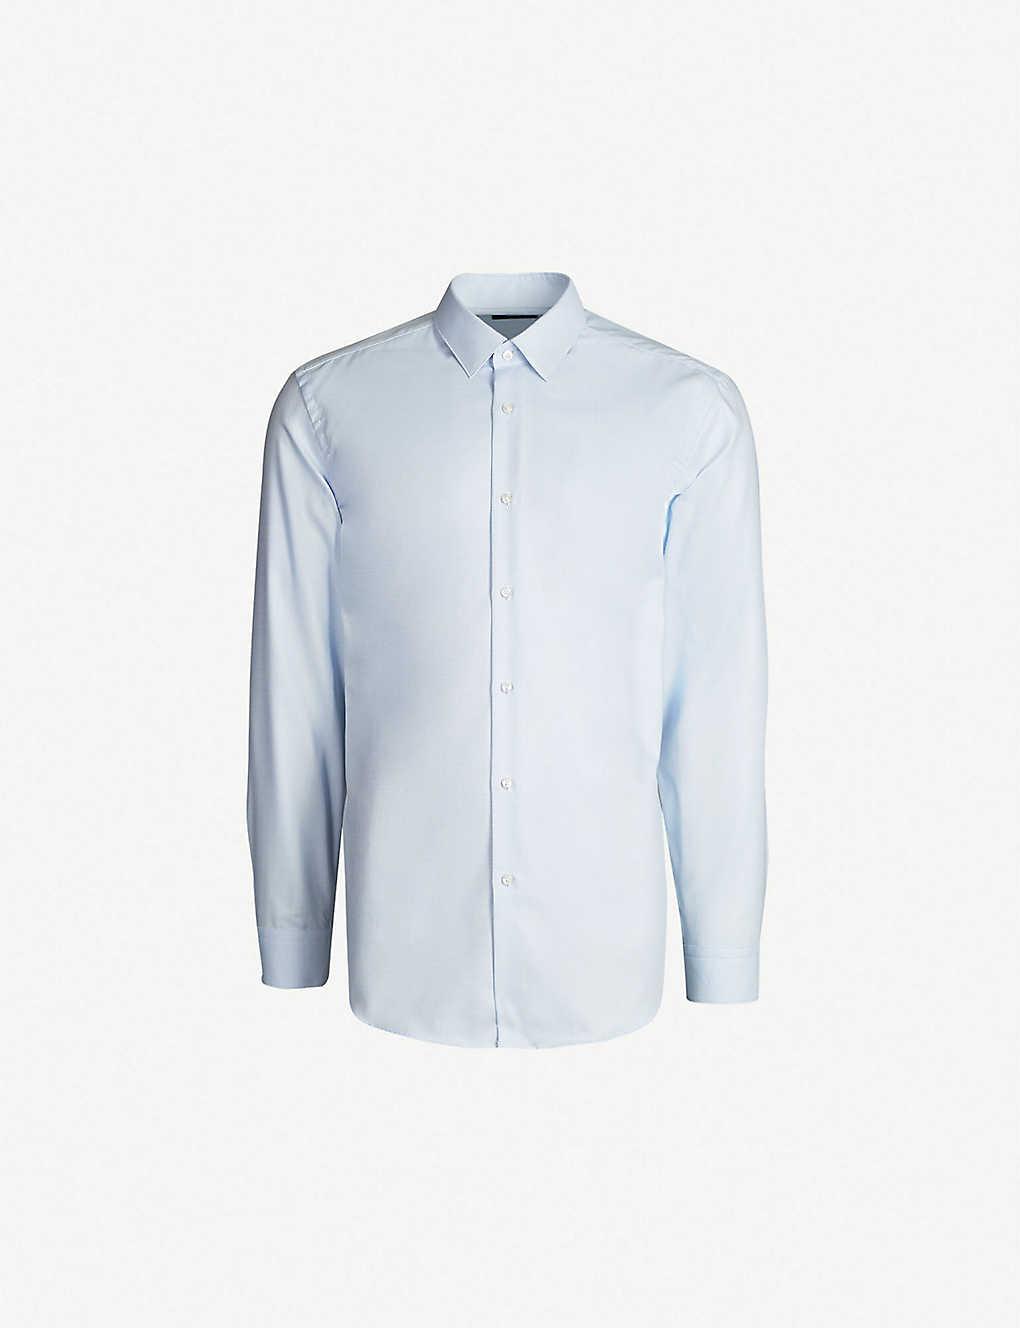 e7a26f8fa0a5 BOSS - Micro check-patterned slim-fit cotton shirt | Selfridges.com